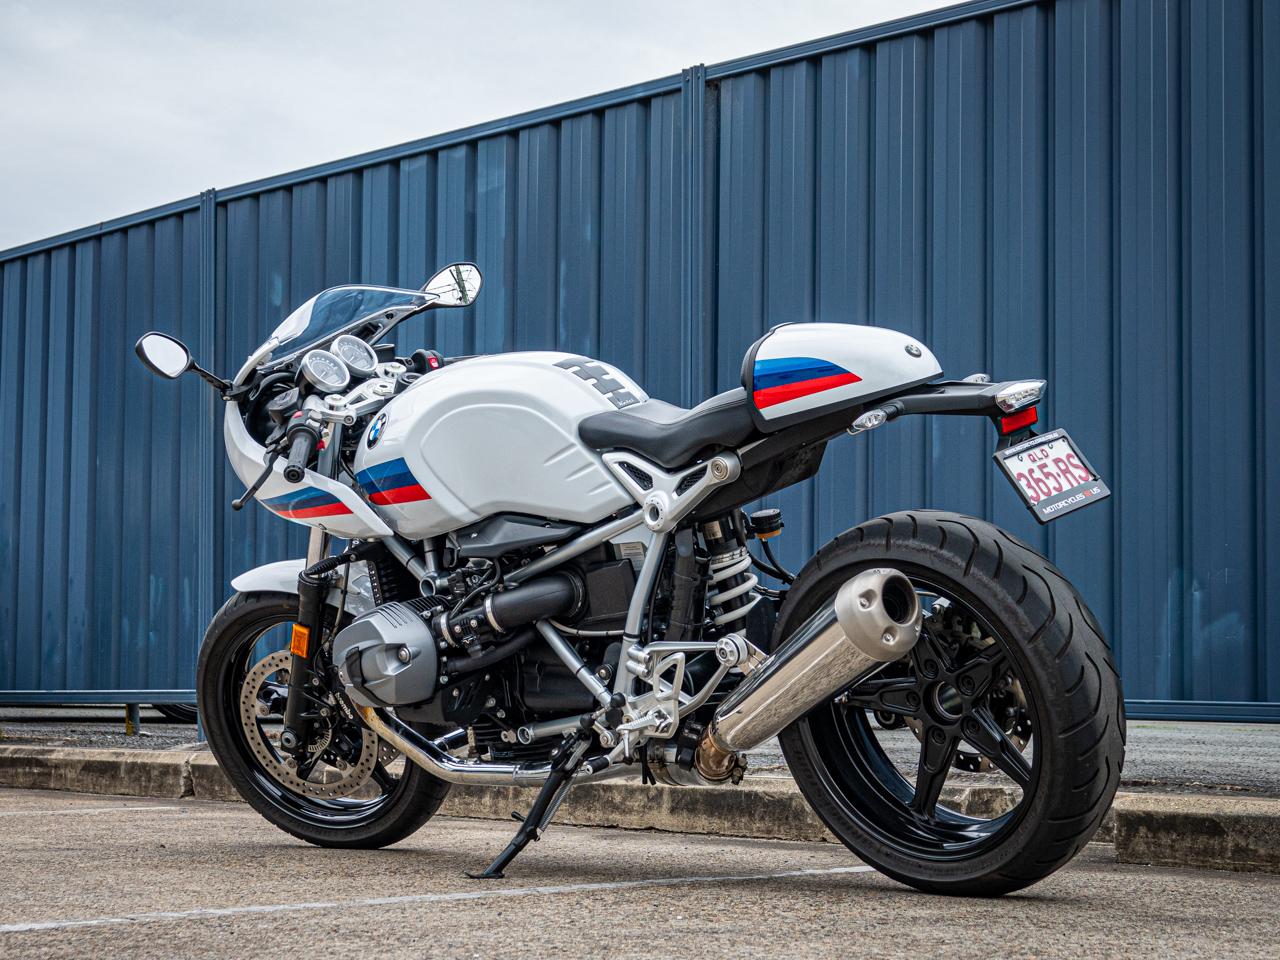 BMW R nine T Racer 2017 - Light White ⋆ Motorcycles R Us